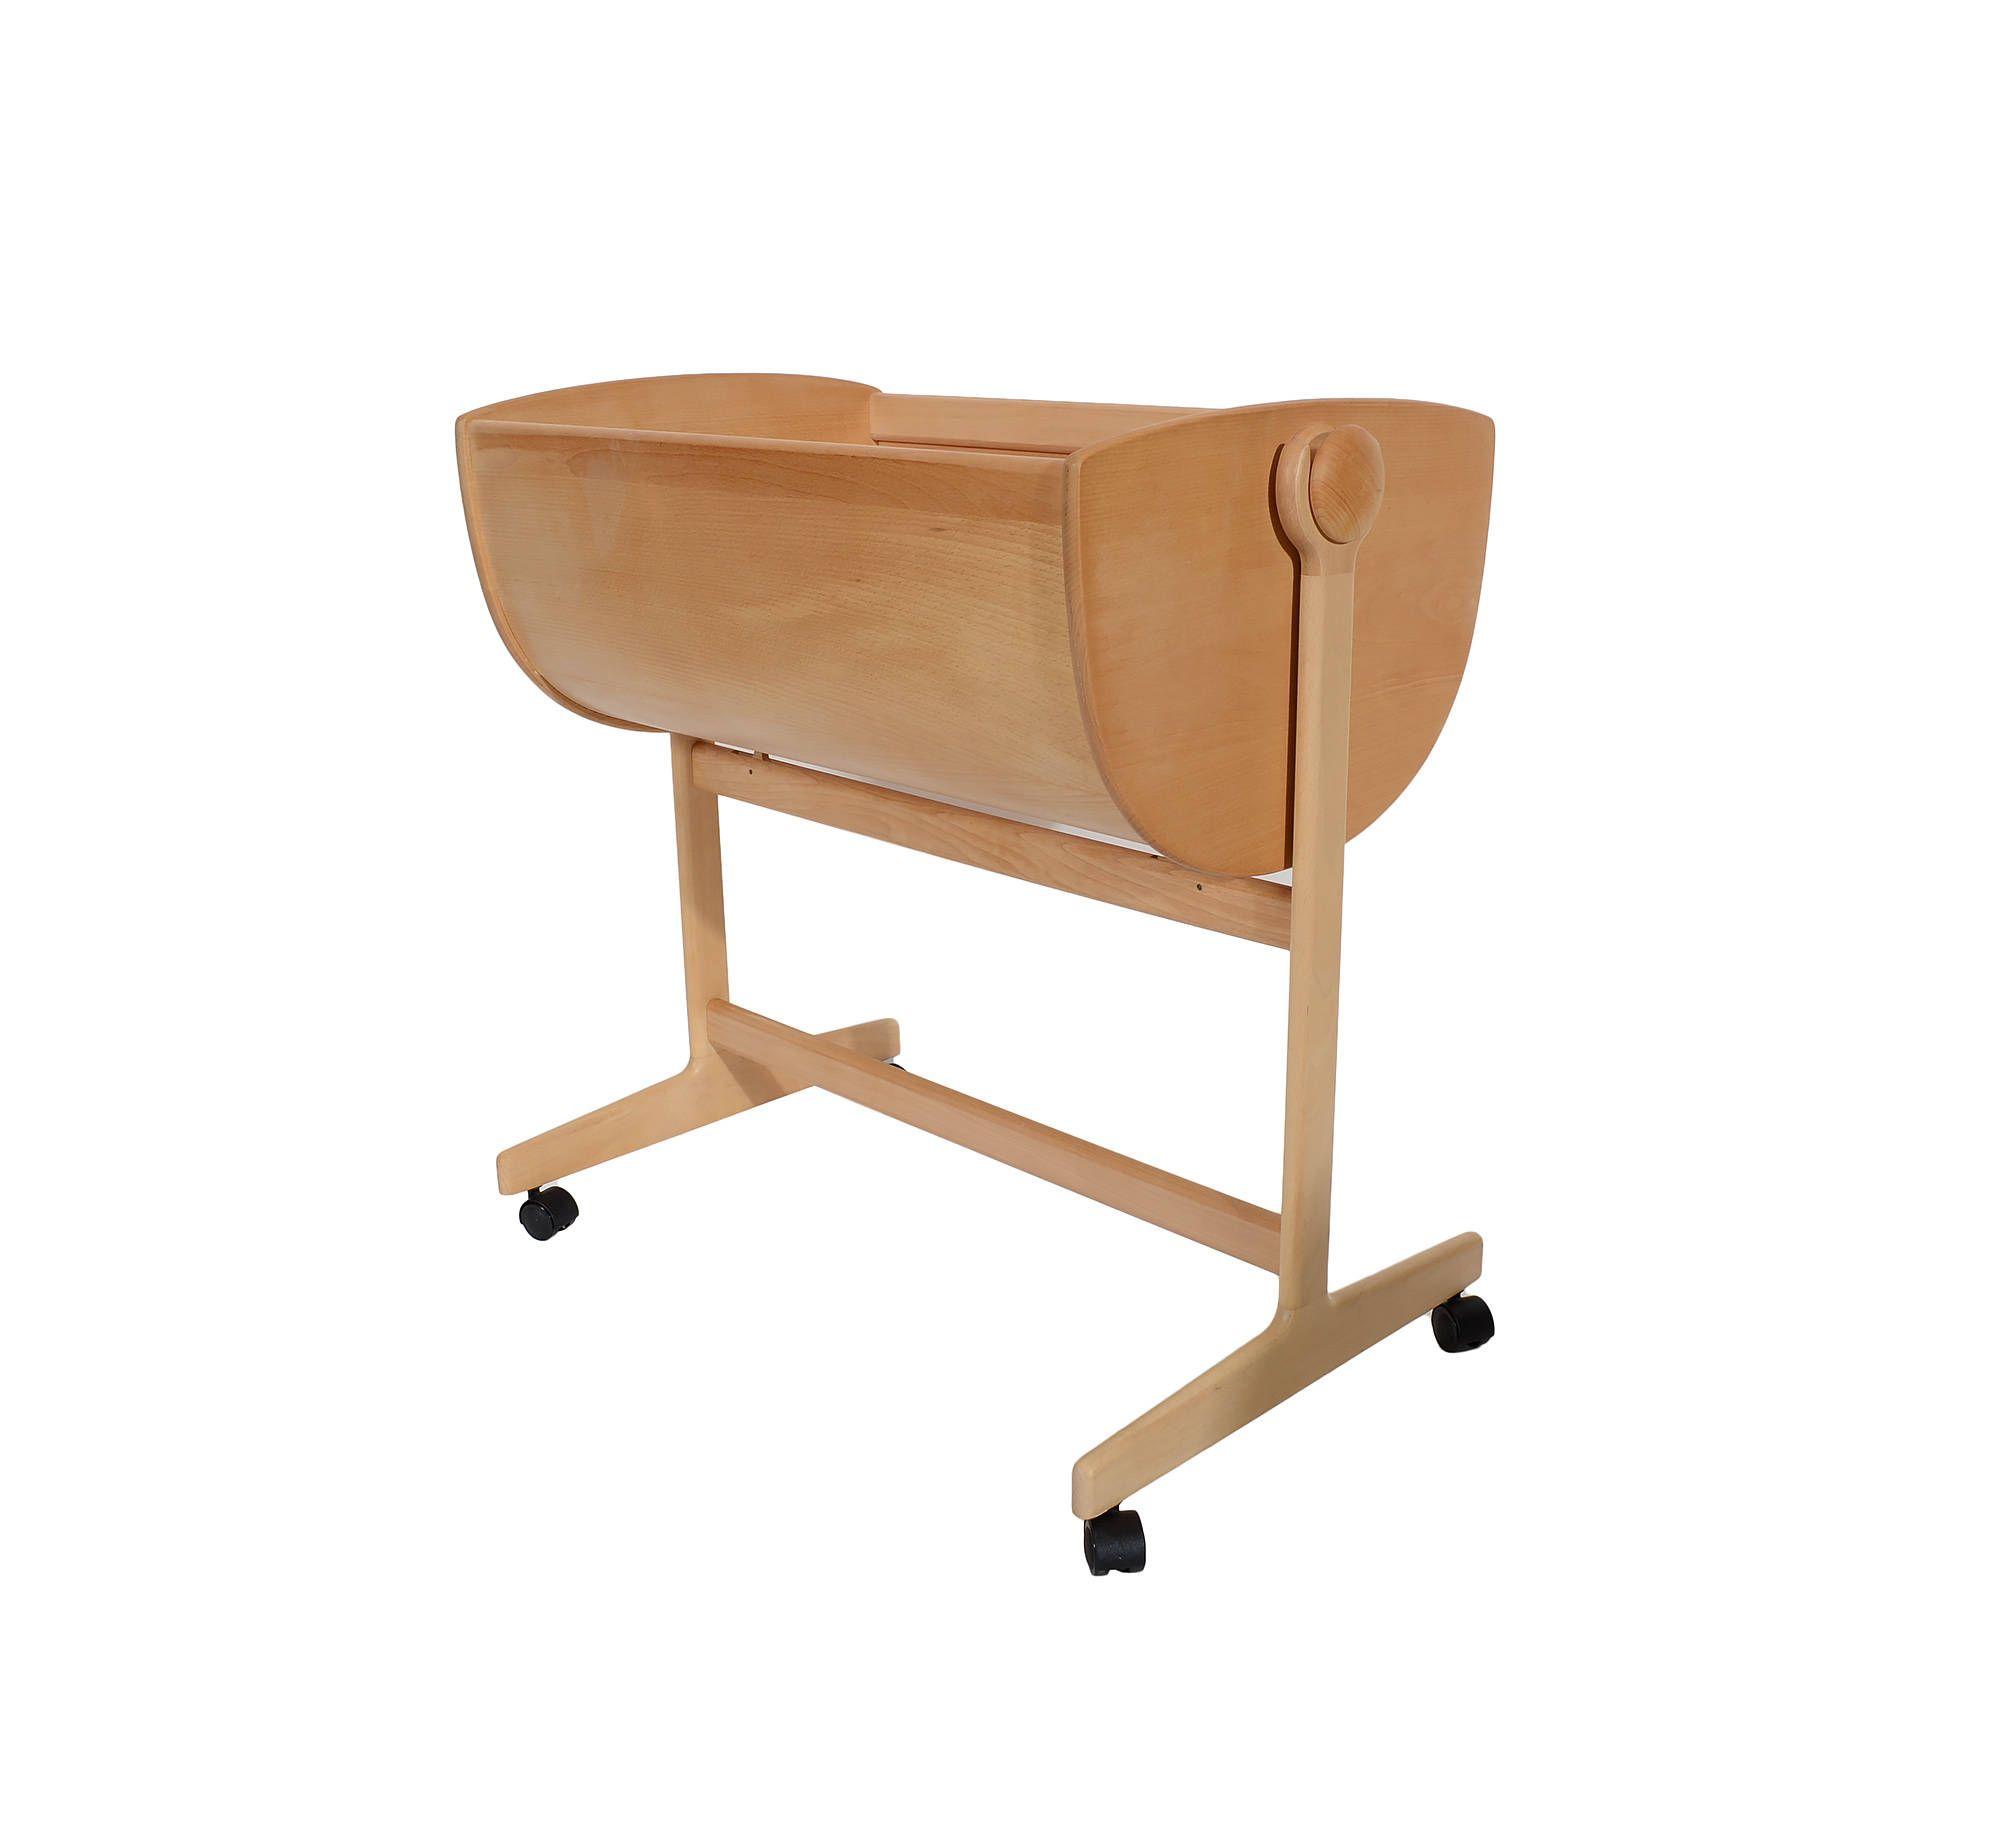 modern cradle - nanna ditzel lulu danish modern rocking cradle or bassinet by